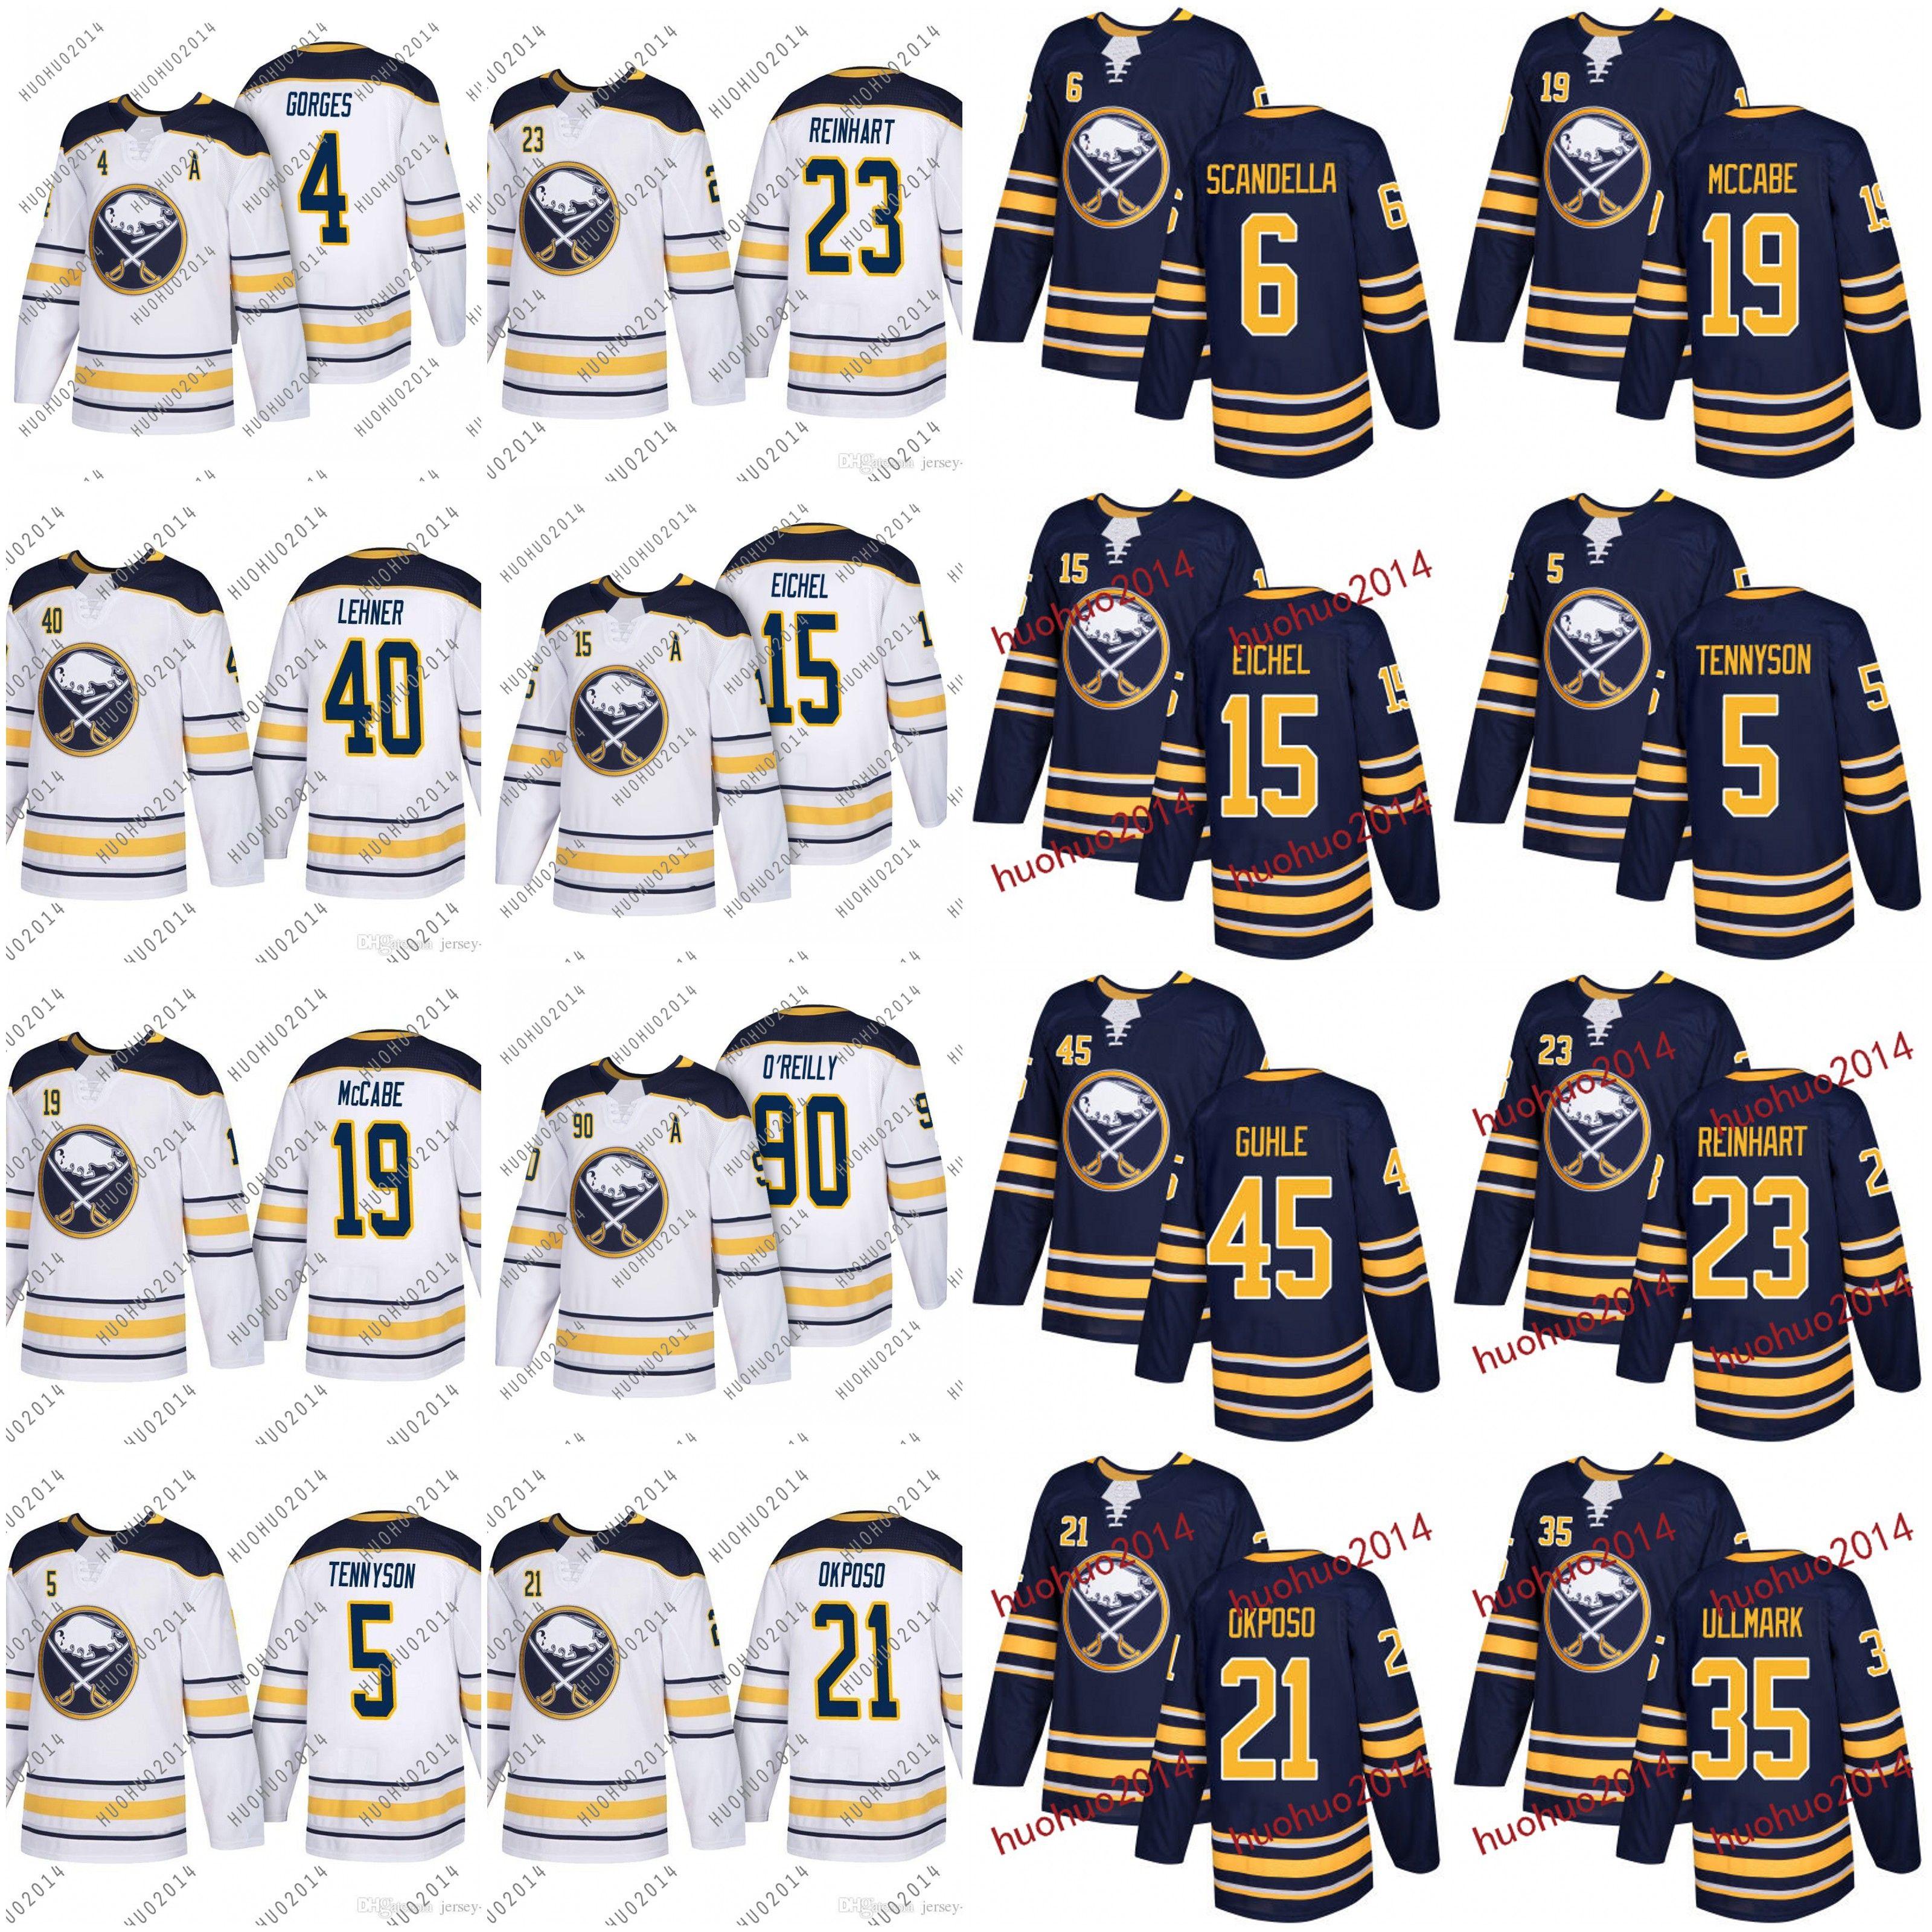 2019 Buffalo Sabres Jersey 2018 Jack Eichel Ryan O Reilly Kyle Okposo Matt  Moulson Evander Kane Reinhart Beaulieu Guhle Ulmark Hockey Jerseys From ... 9ef0897c4